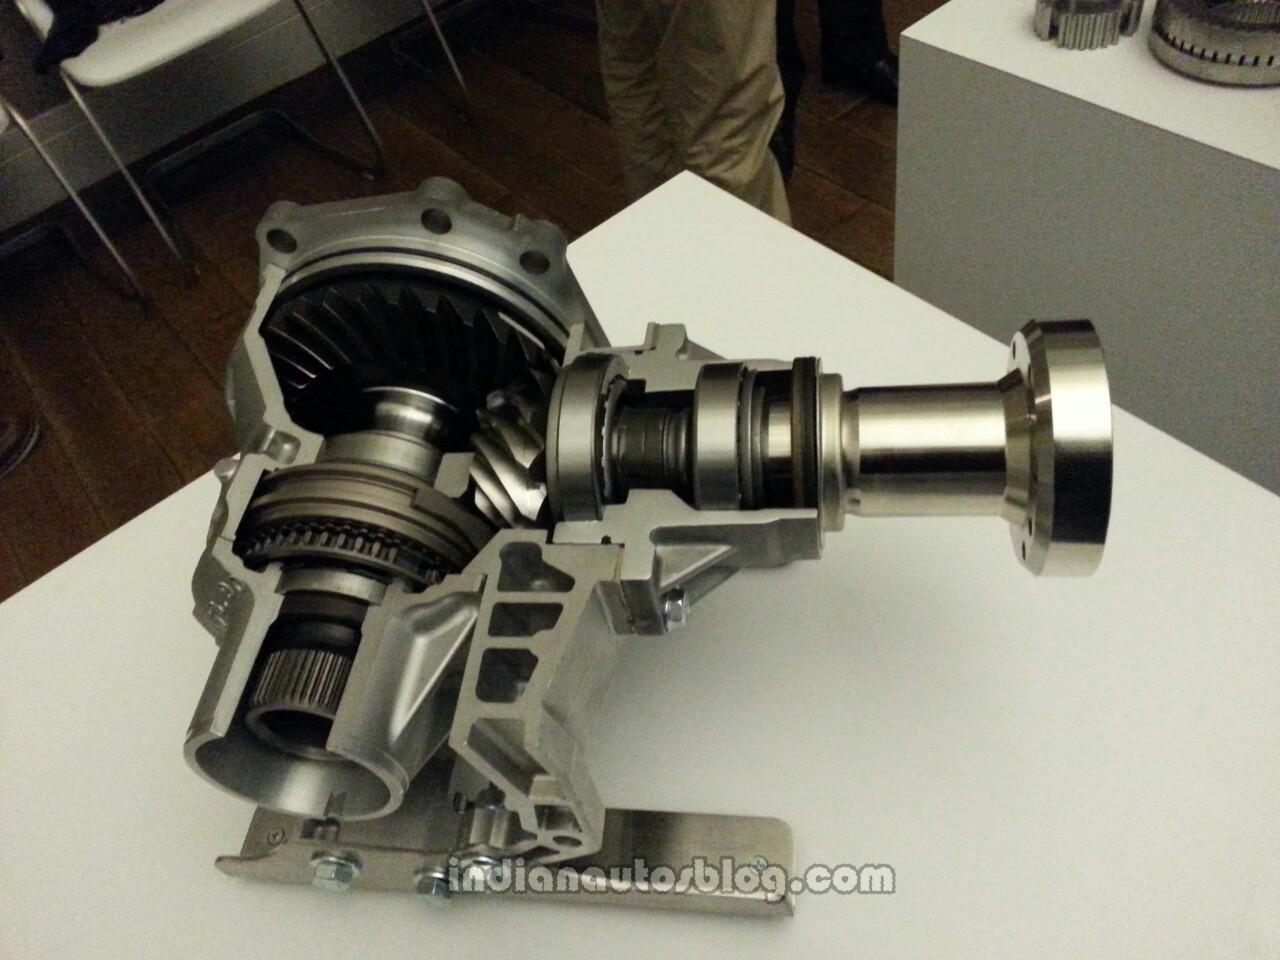 Range Rover Evoque Speed Gearbox Image on Zf Gearbox Opel